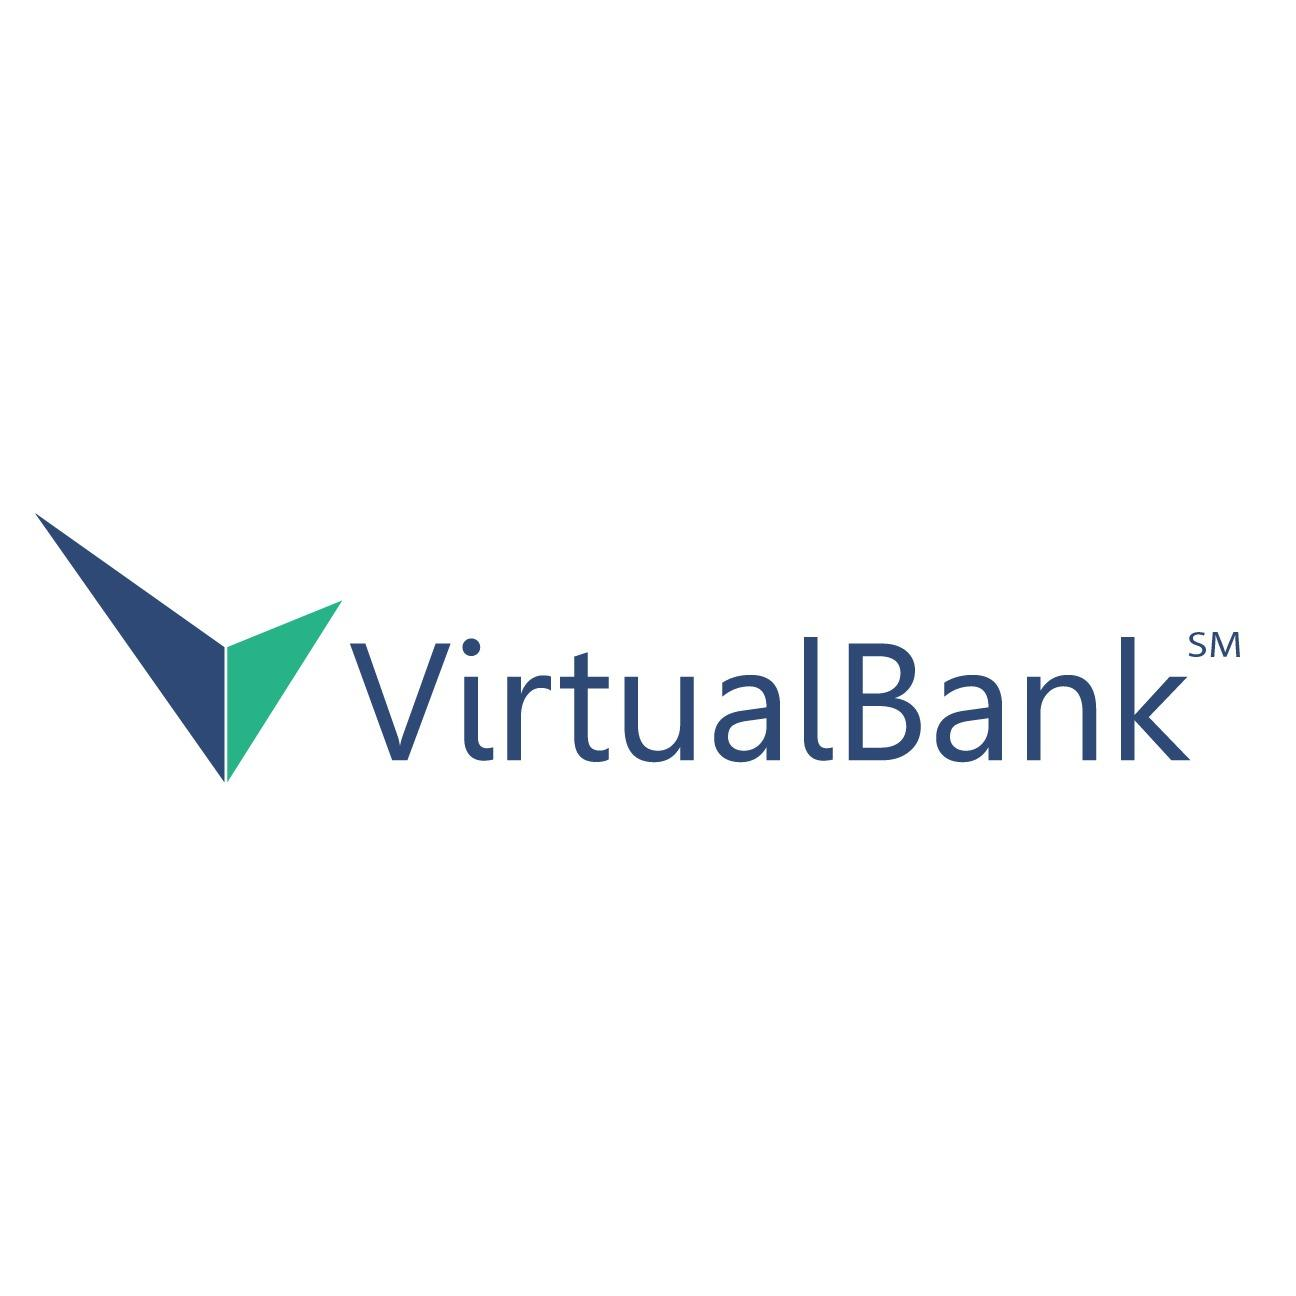 VirtualBank, a Division of IBERIABANK